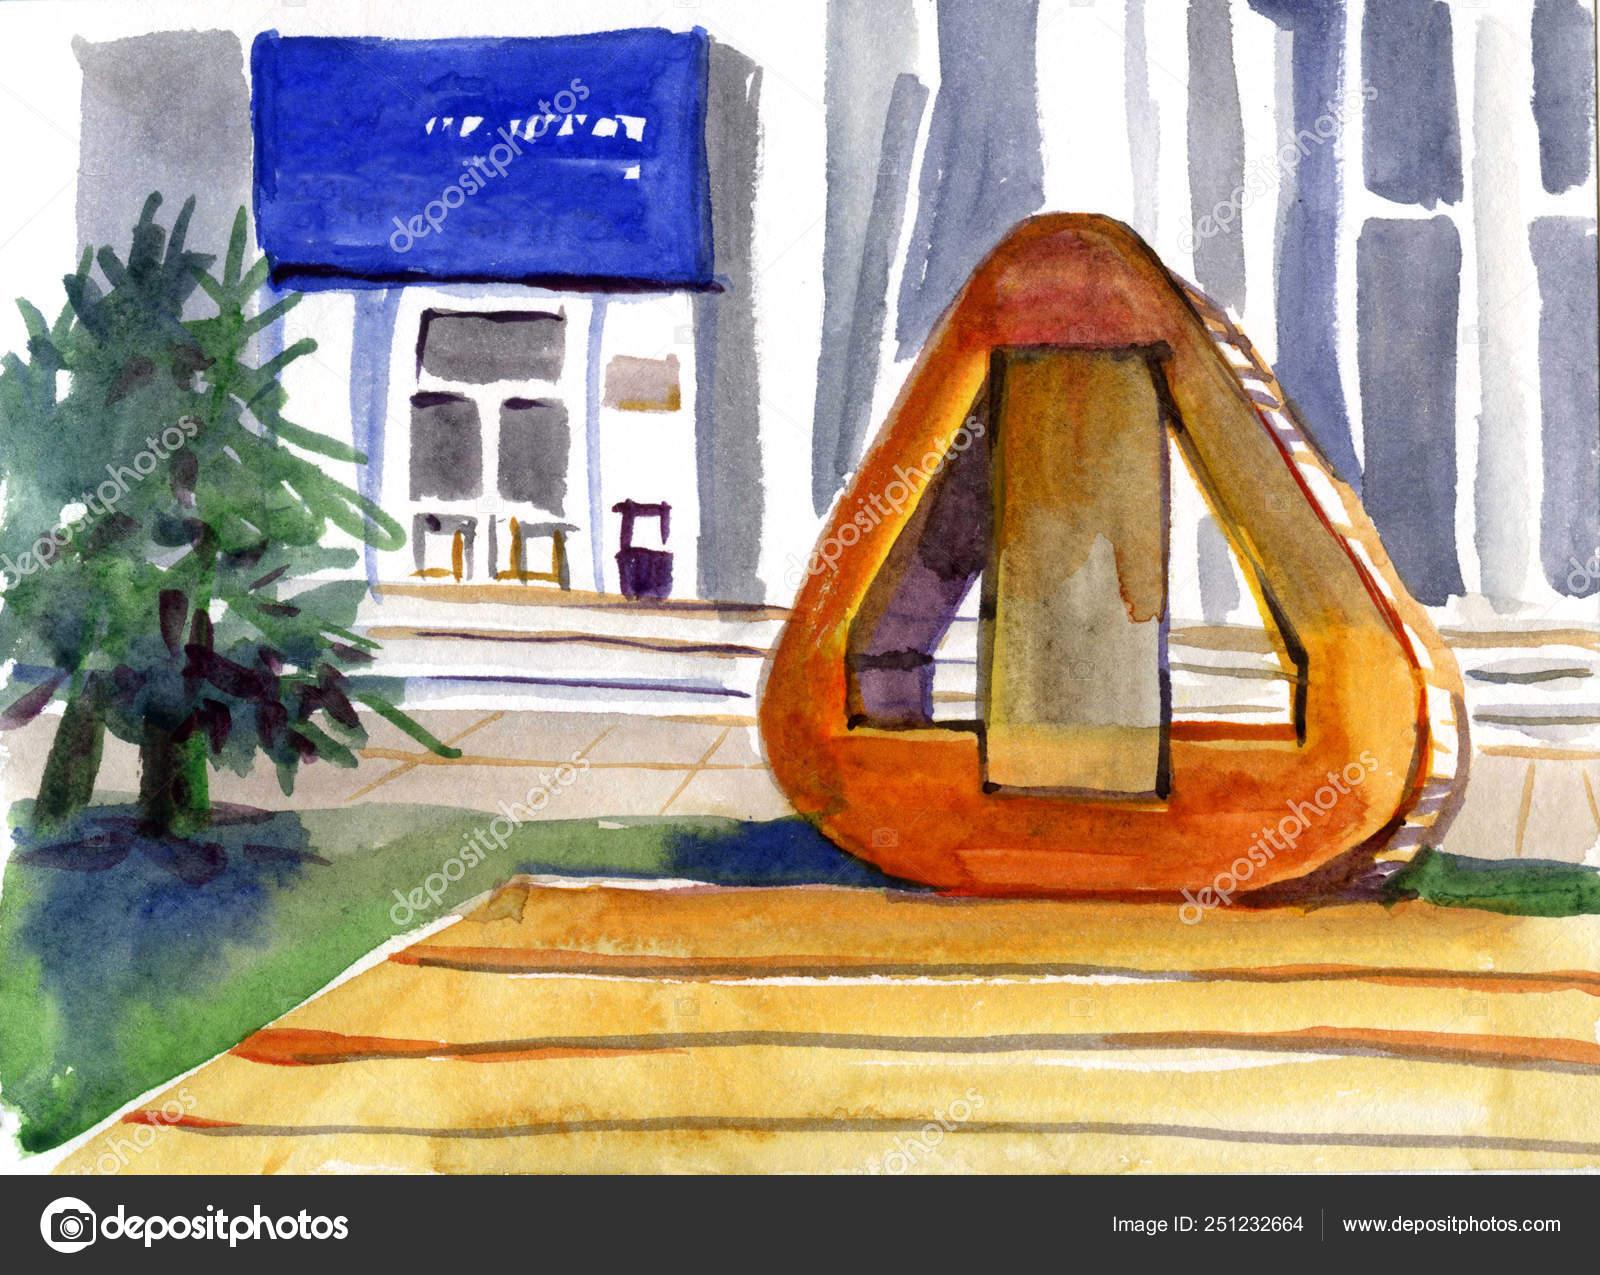 Ilustración Acuarela Hermosa Azotea Terraza Exterior Con